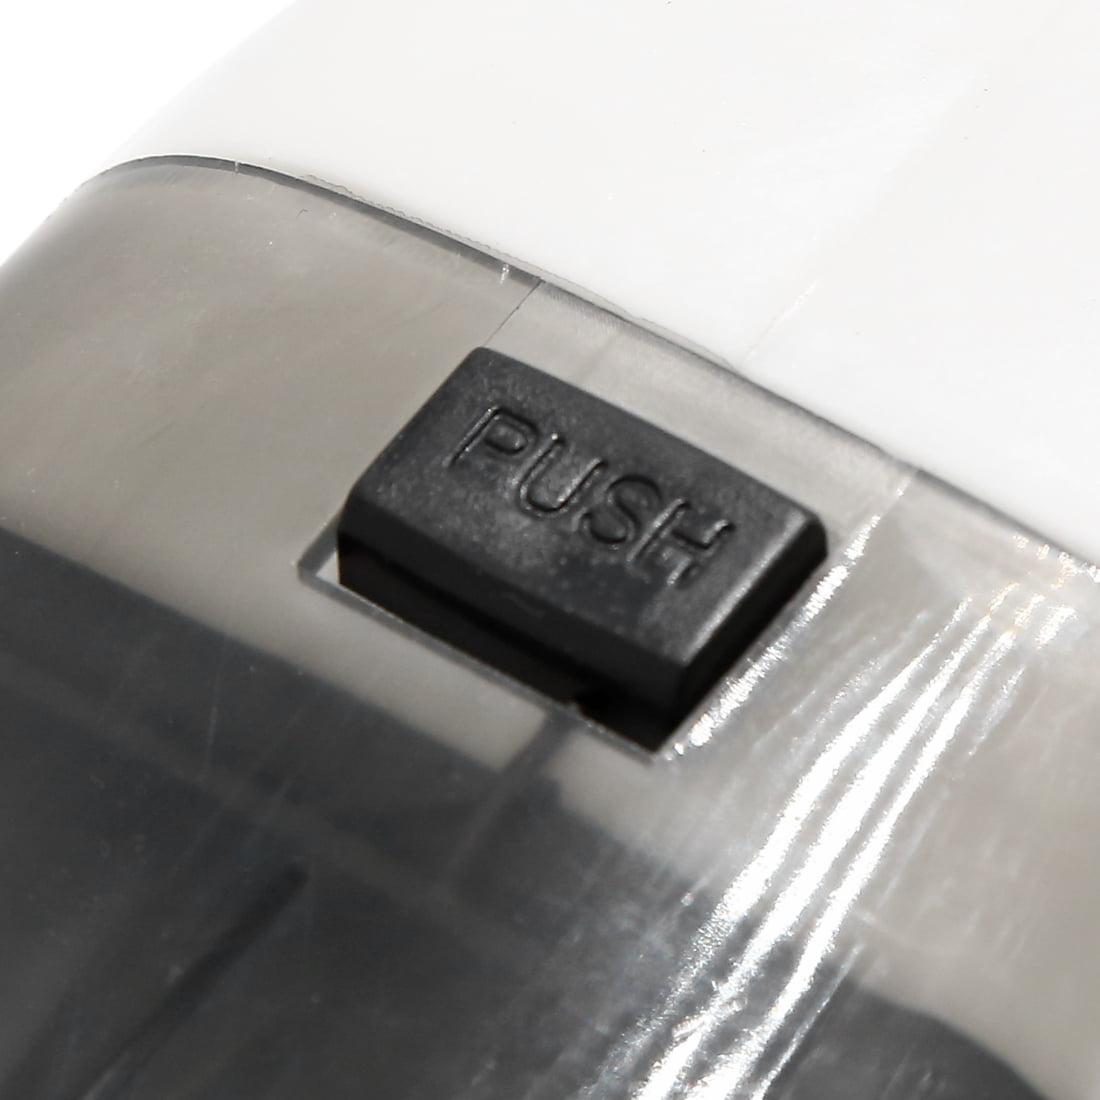 White DC 12V Car Cigarette Lighter Plug Wet and Dry Portable Vacuum Cleaner - image 2 de 3